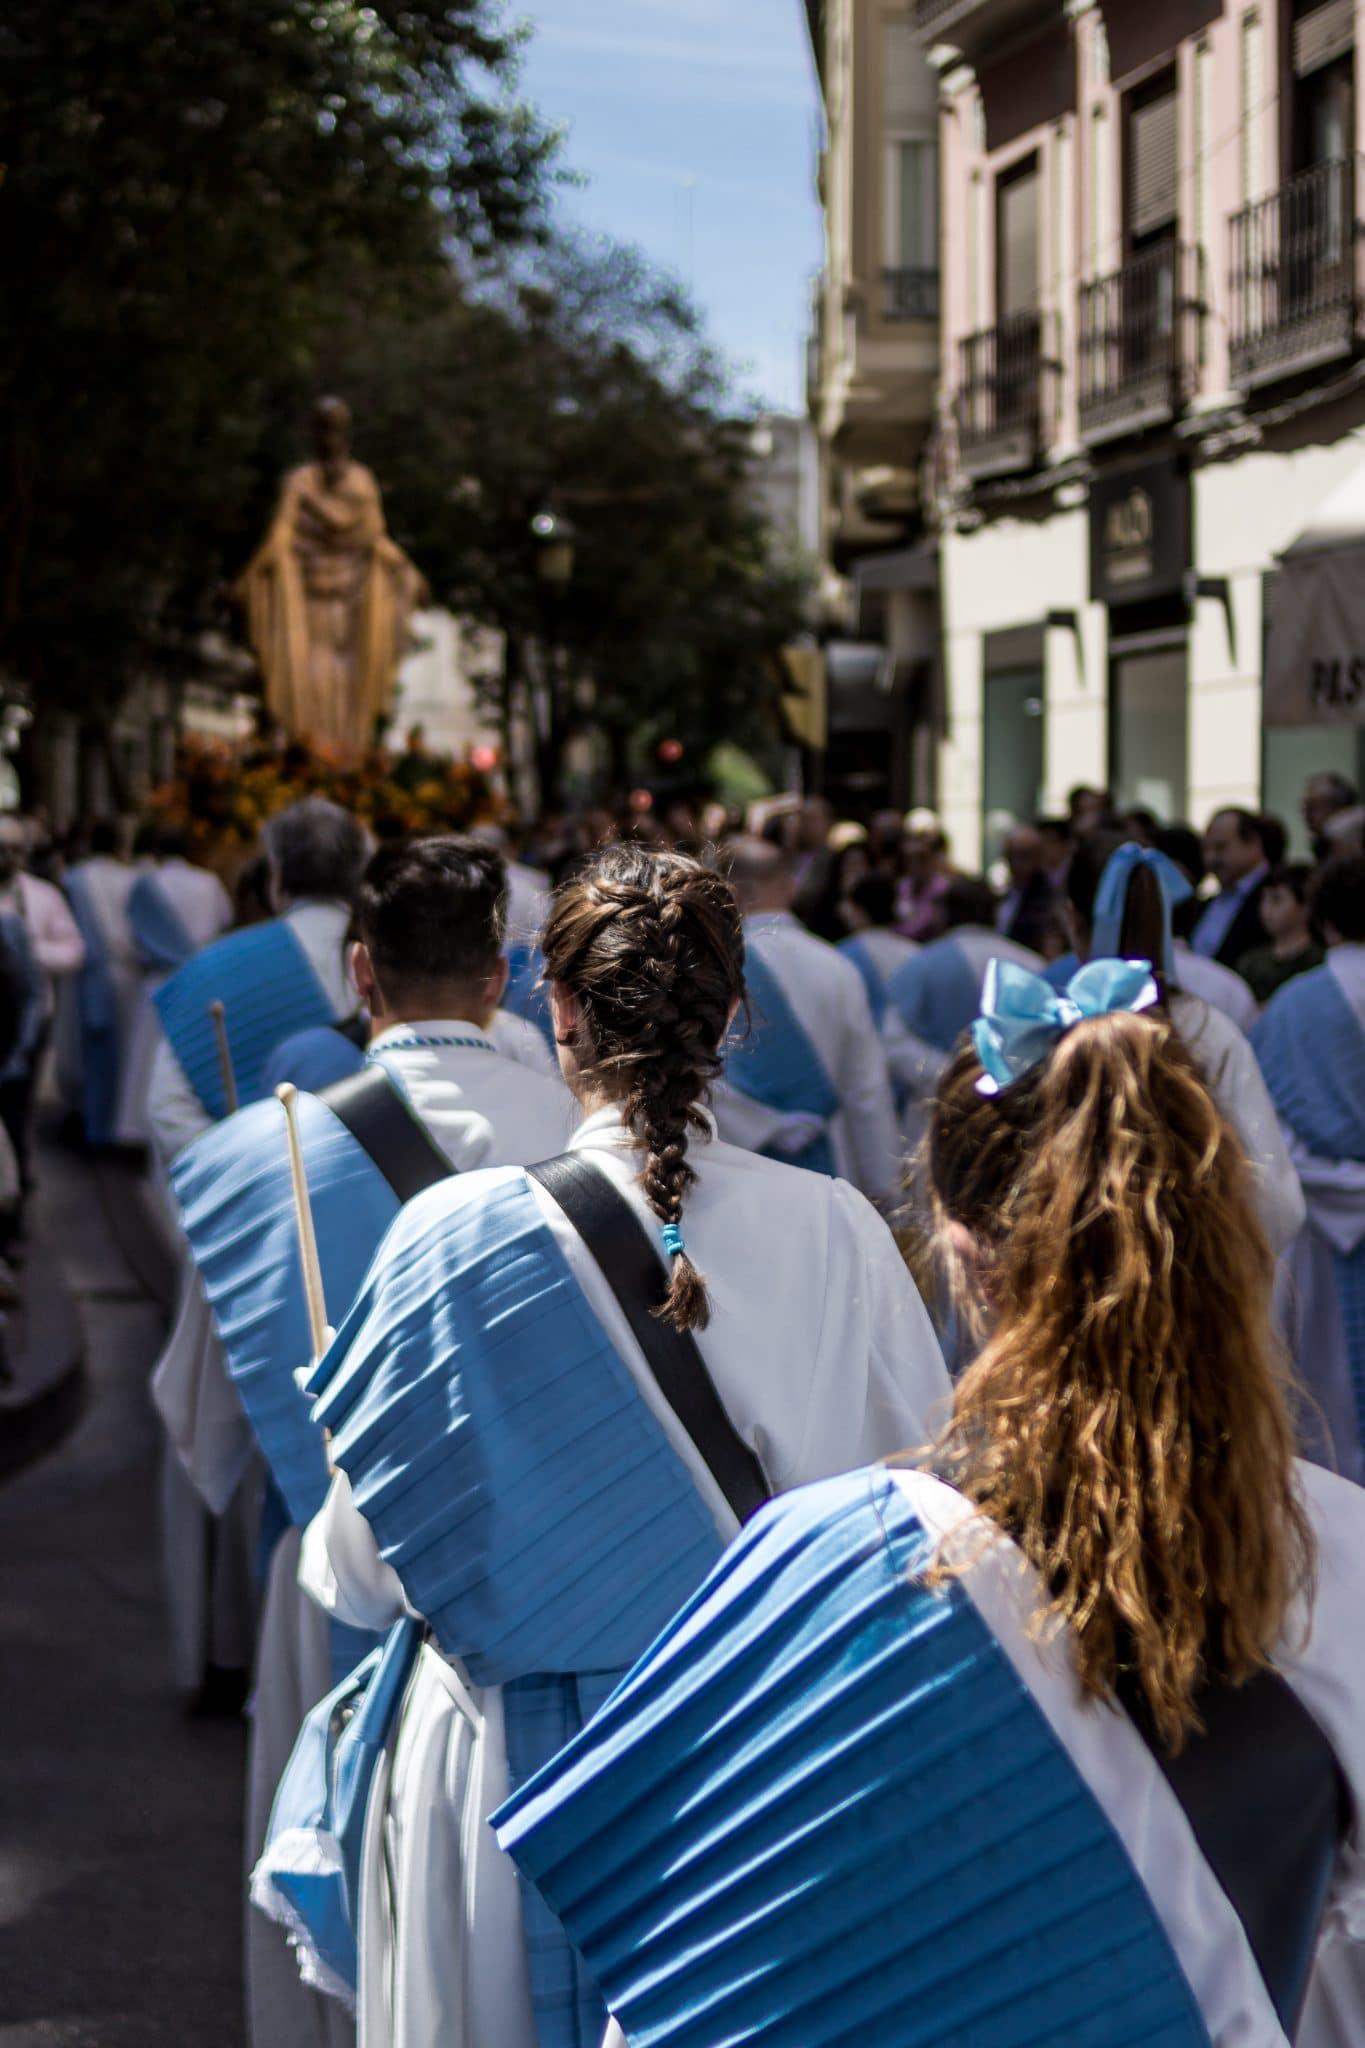 Semana Santa en Zaragoza - Procesión encuentro glorioso